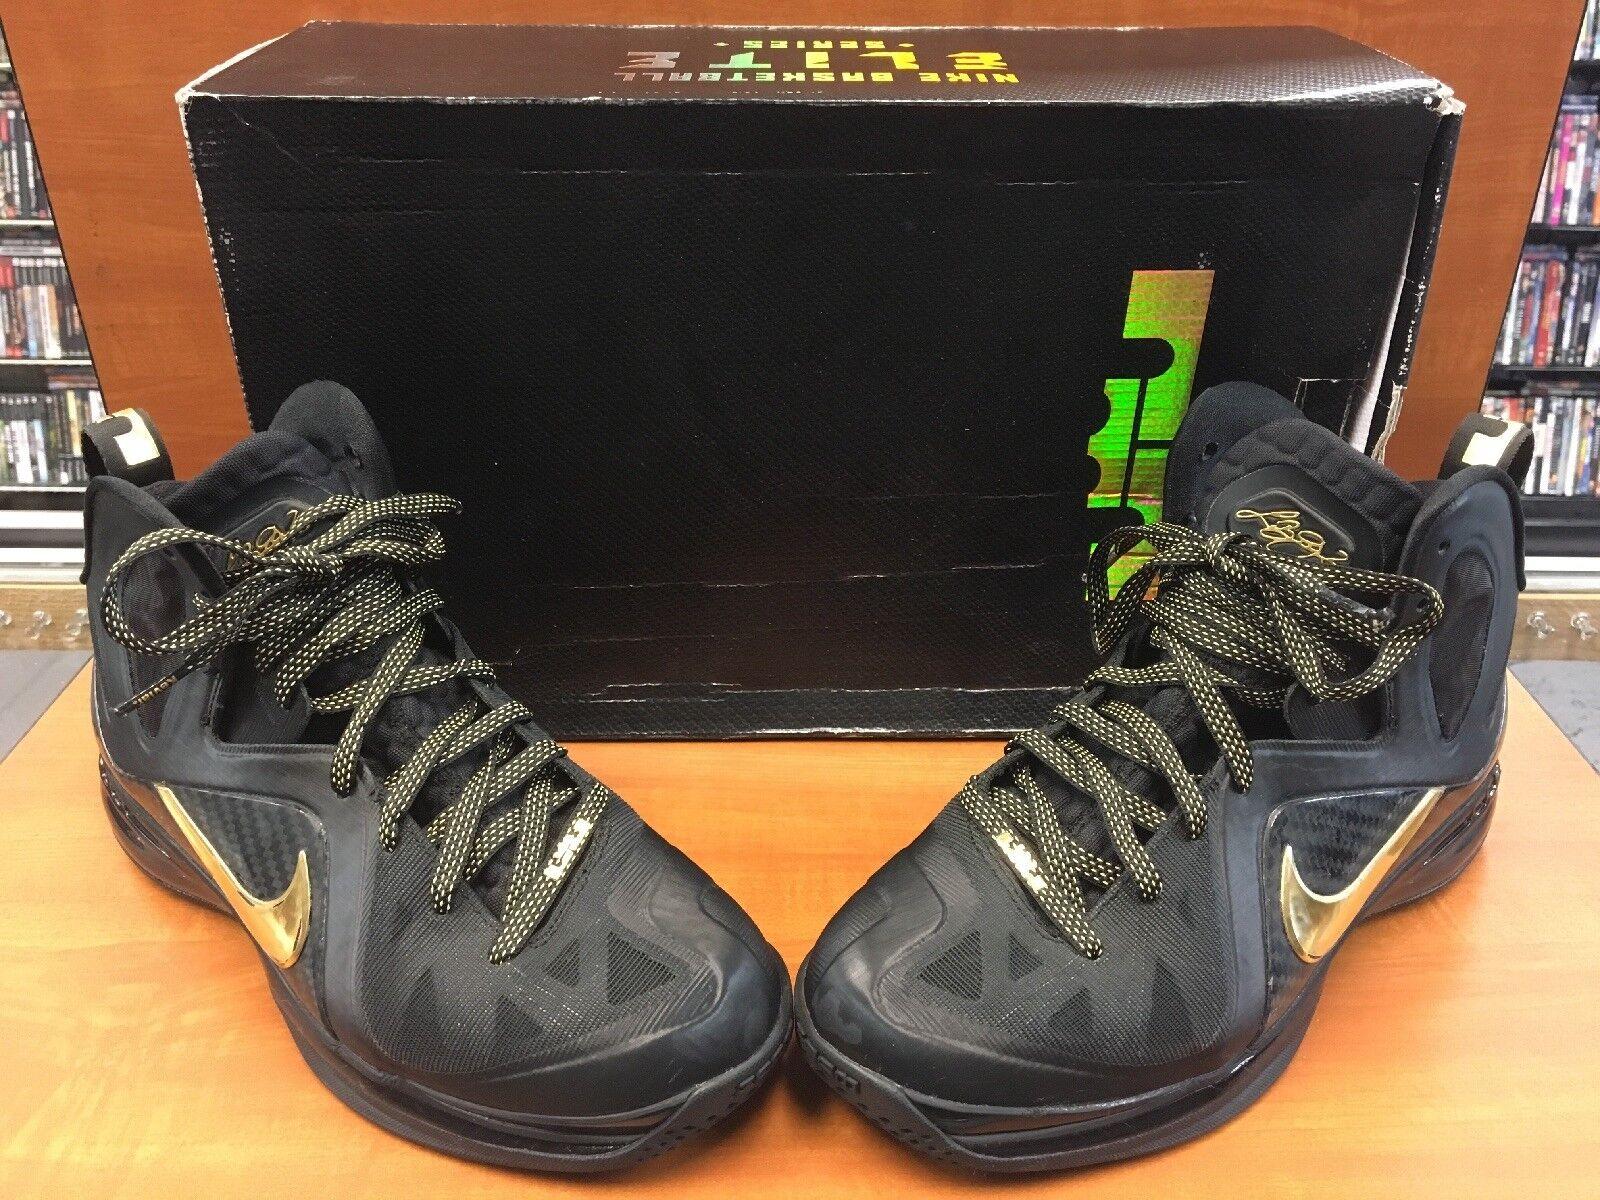 "Nike Lebron 9 IX P.S. Elite ""Away"" Black Metallic gold 526958-002 Men's Size 8"